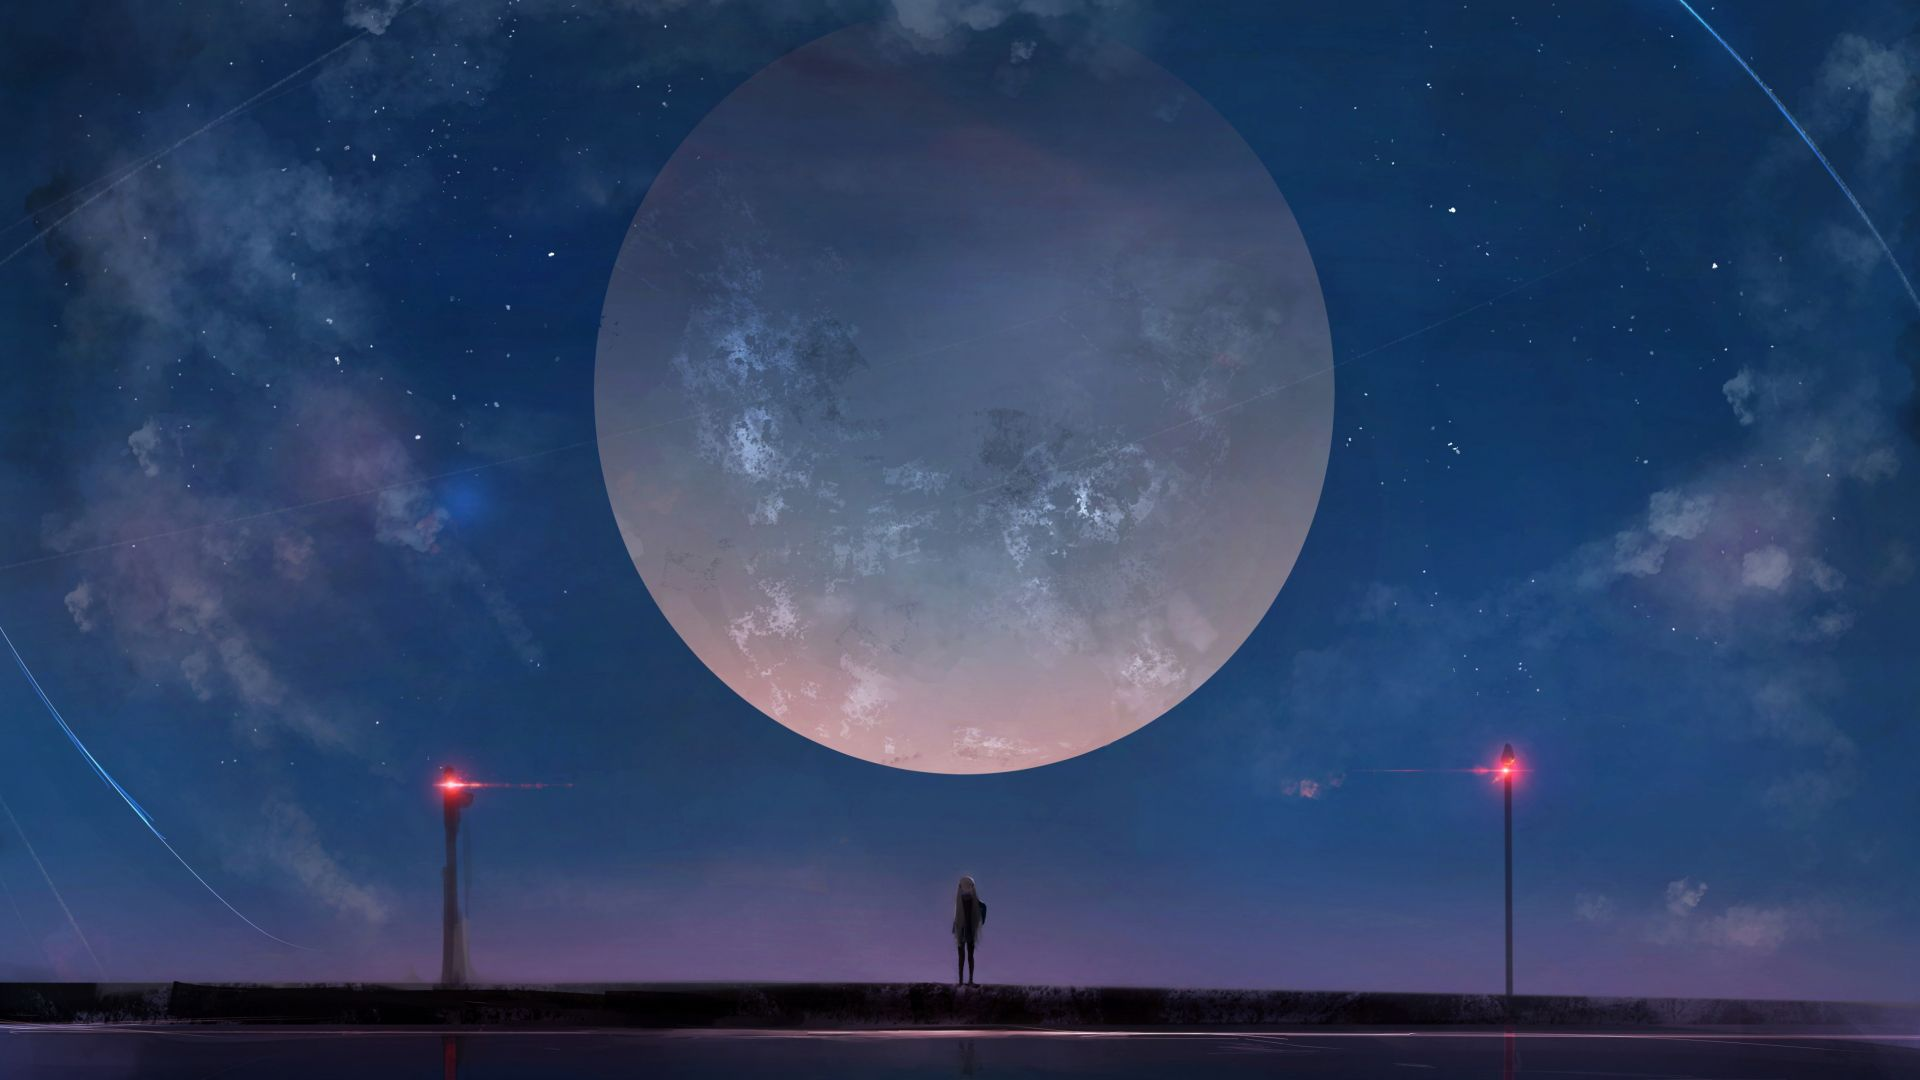 Wallpaper Big moon, anime girl, night, outdoor, 4k